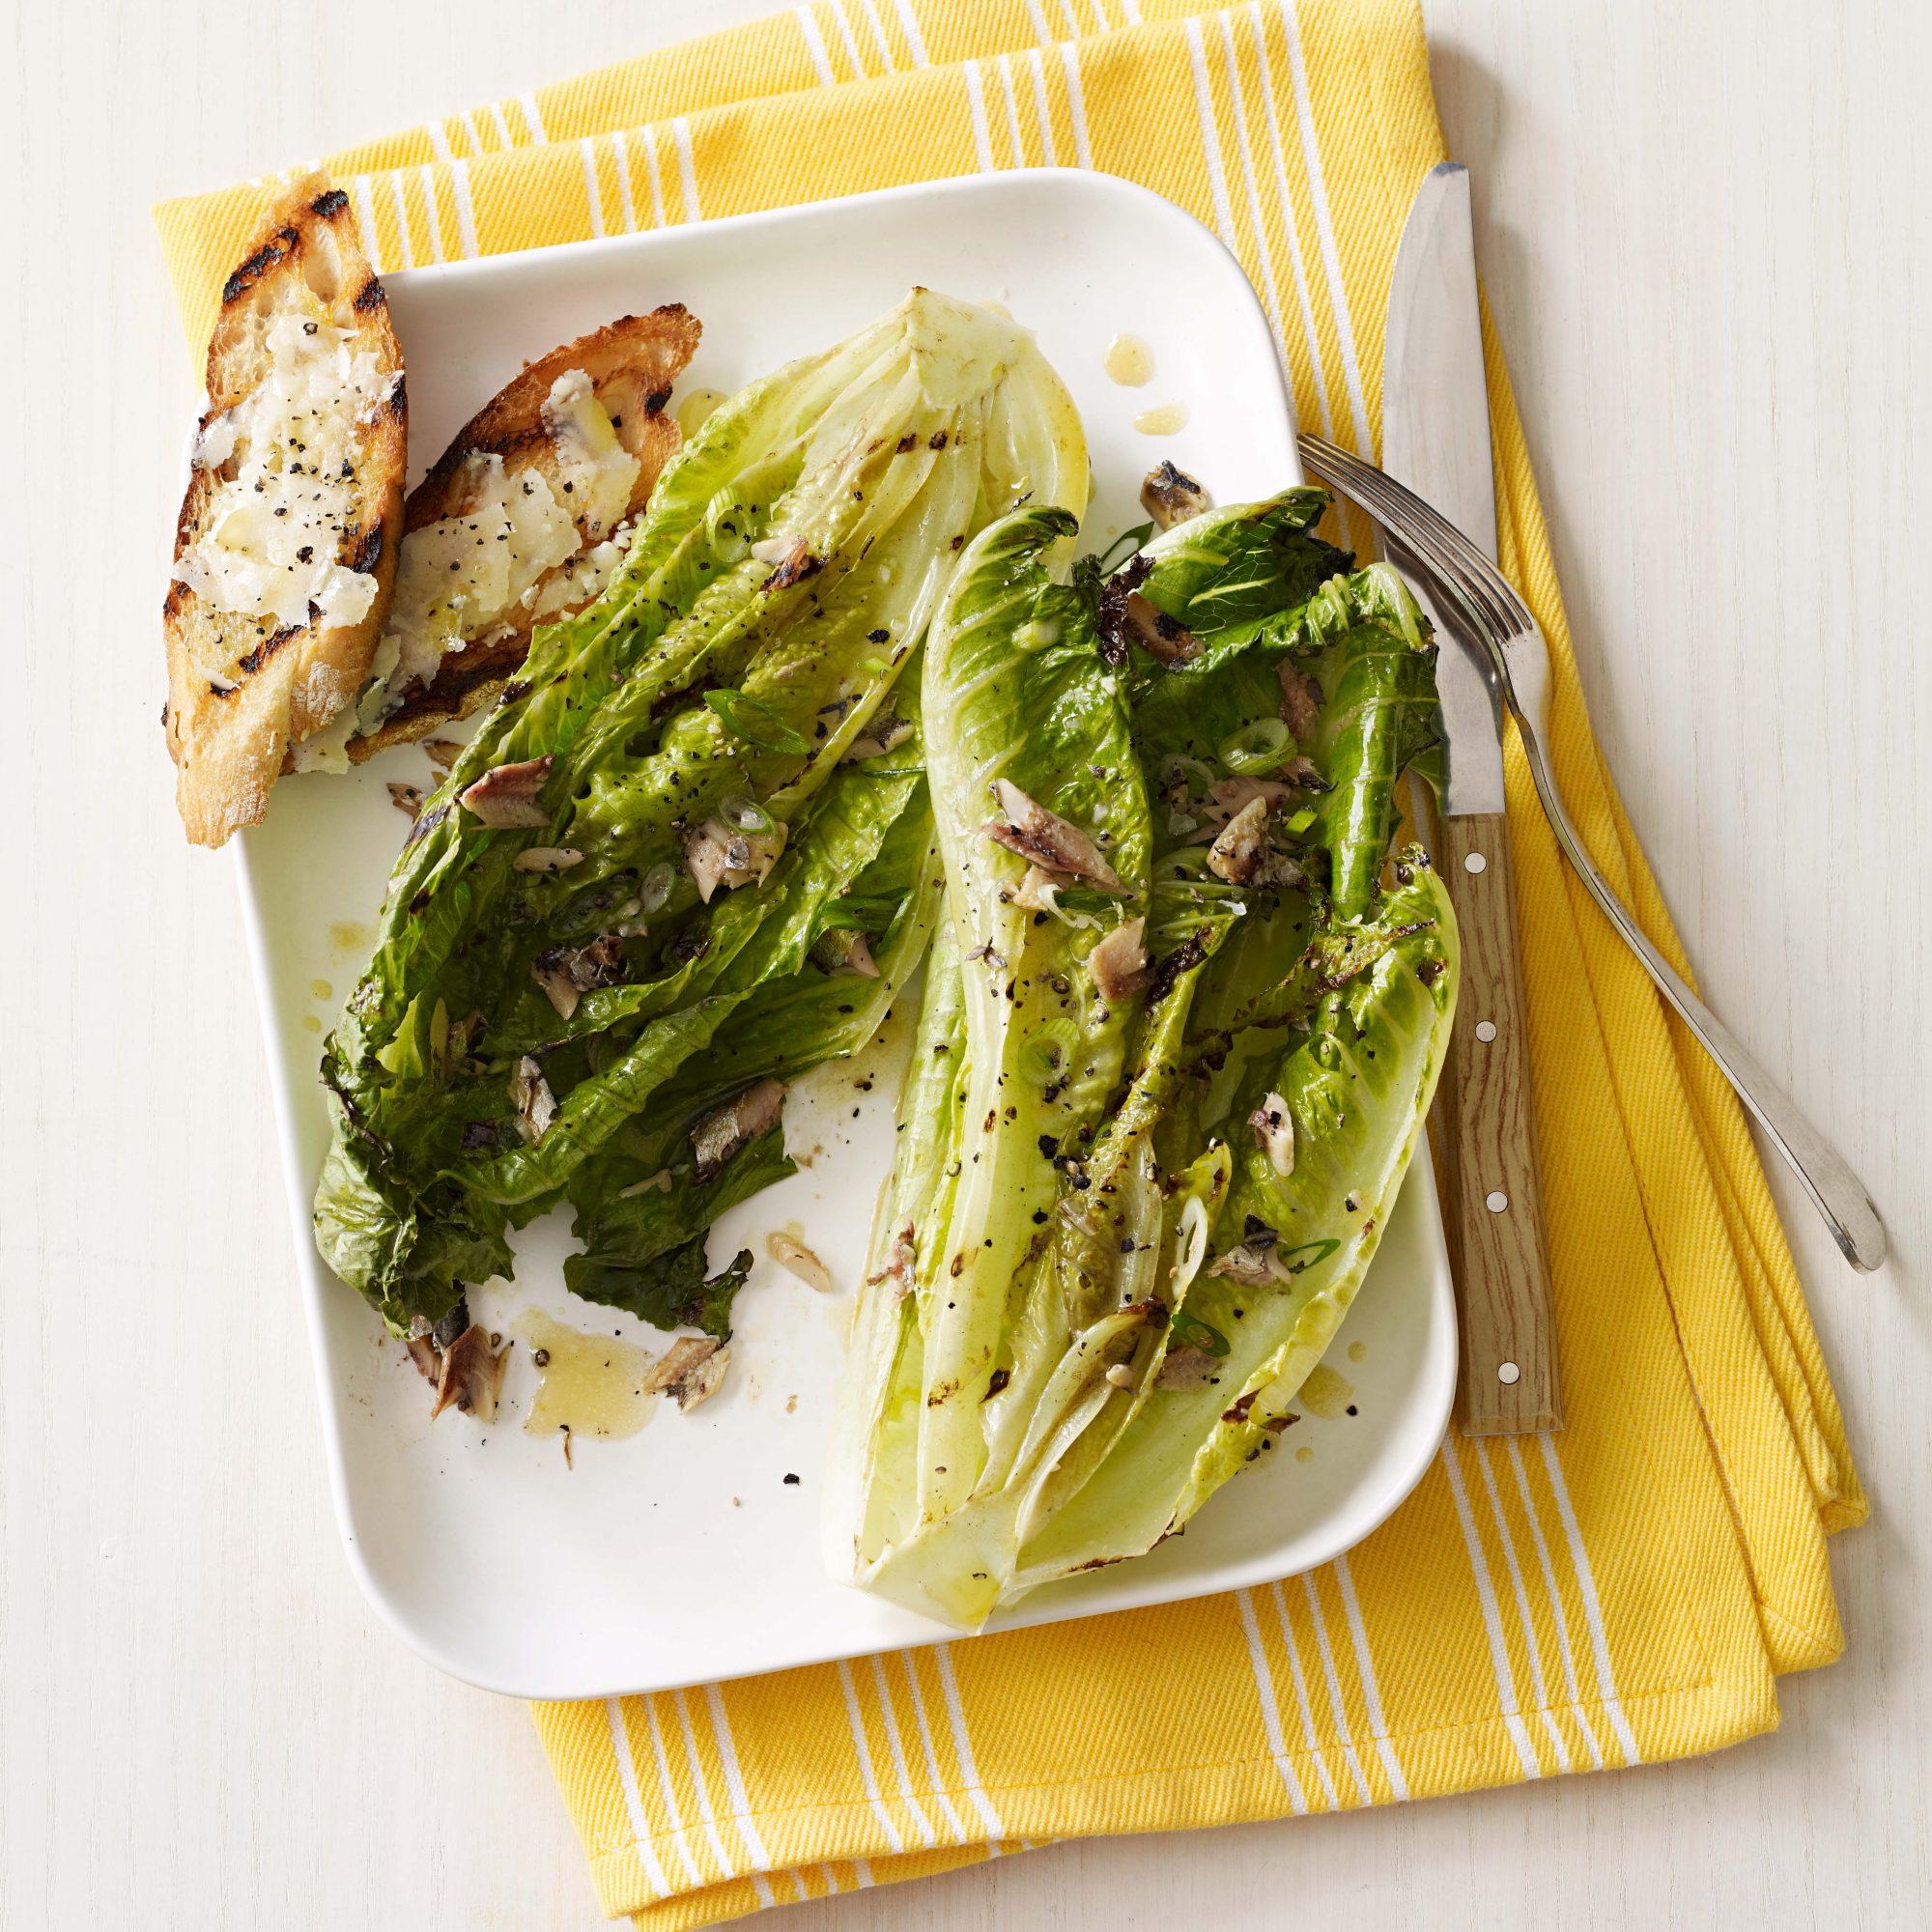 grilled caesar salad with parmesan crostini